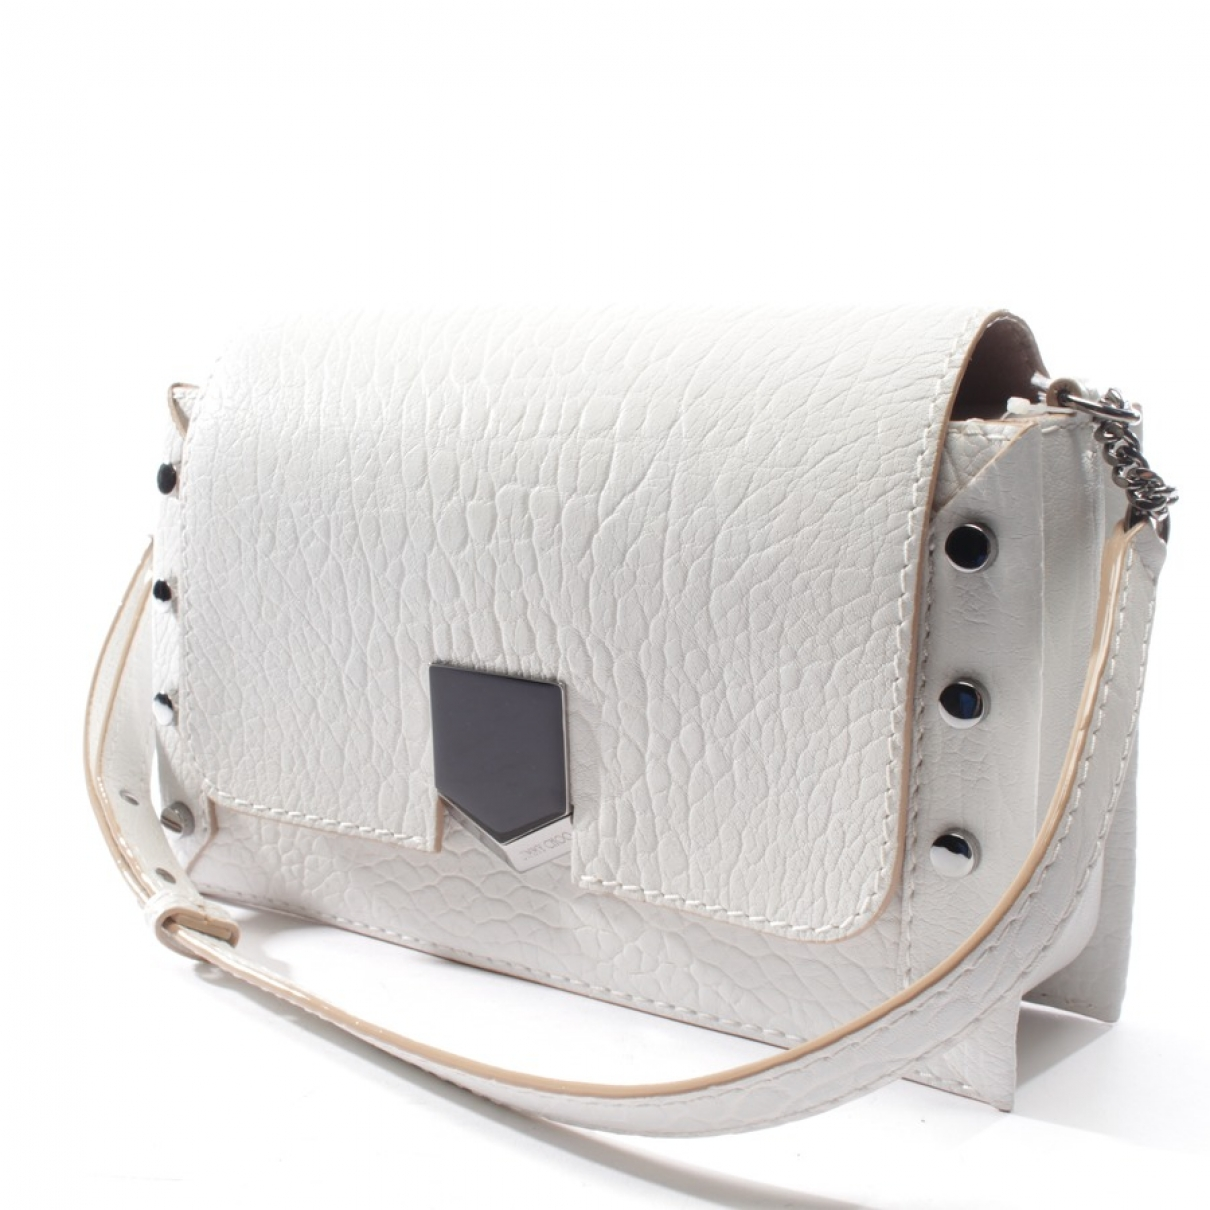 Jimmy Choo Lockett Handtasche in  Weiss Leder